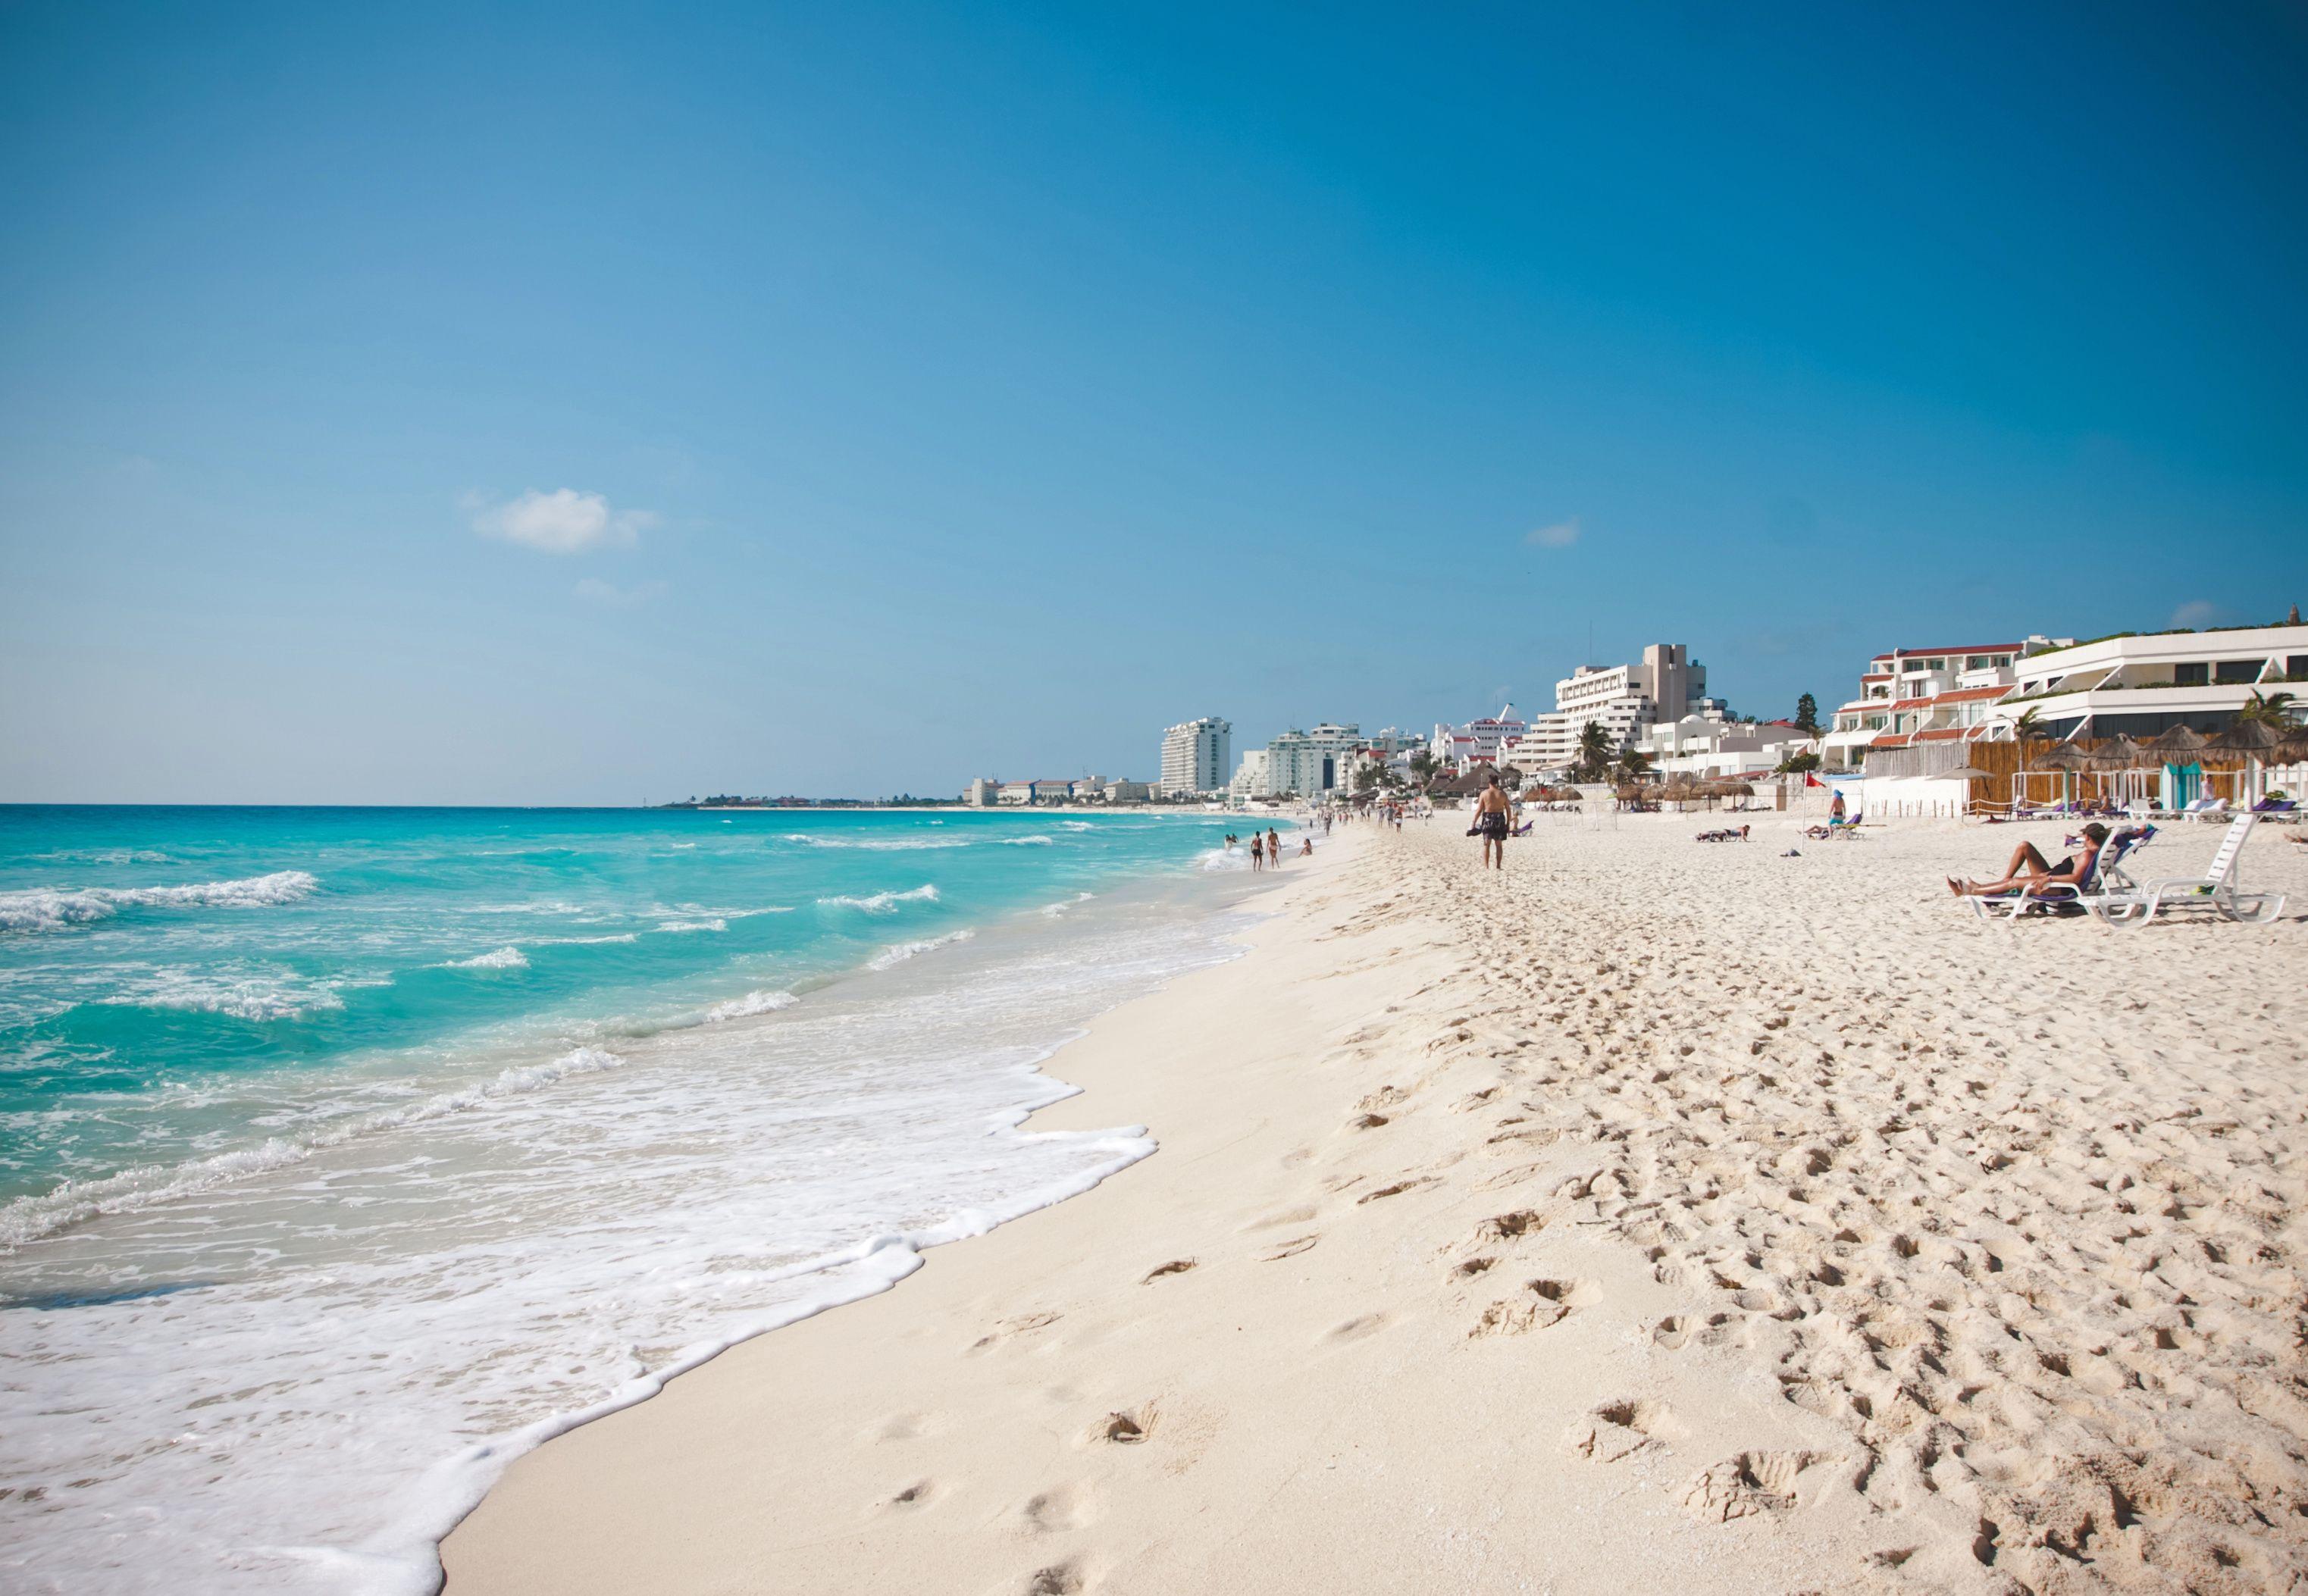 Cancun, Mexico - OrkideEkspressen